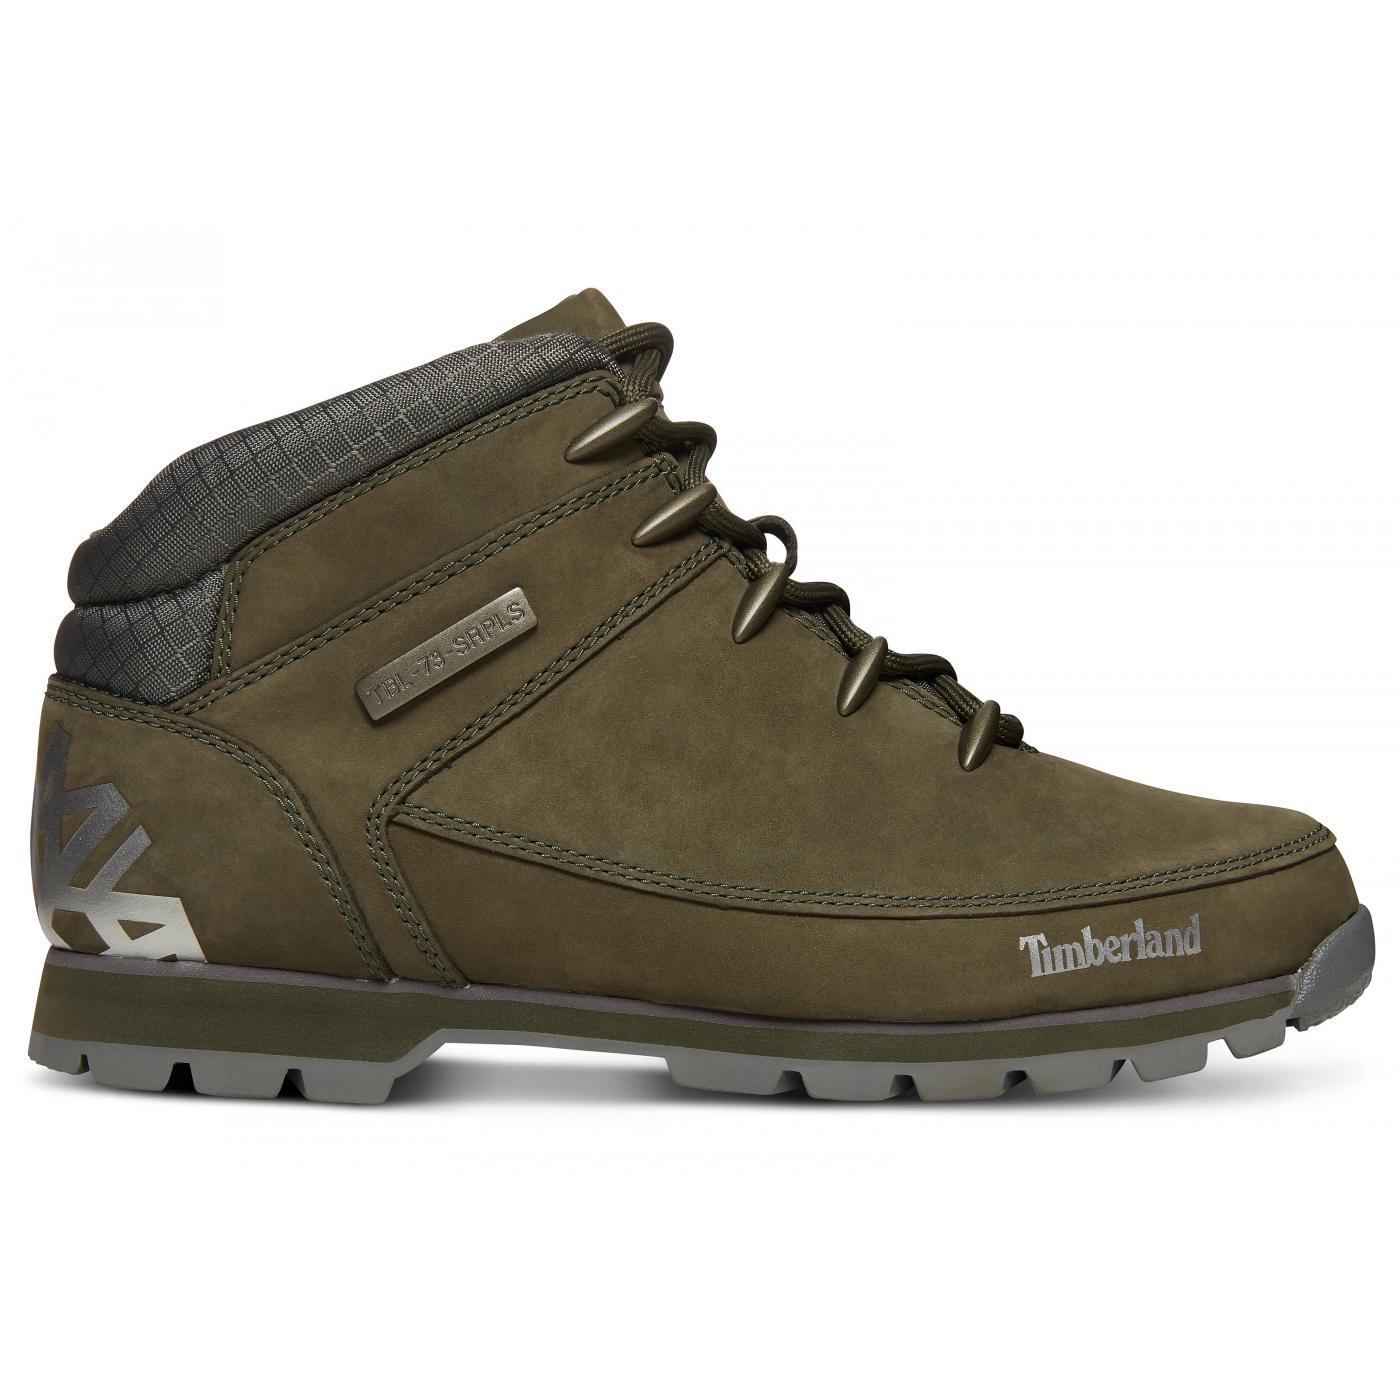 Hiker Euro Chaussures Sprint Timberland Dark Green mn08Nw